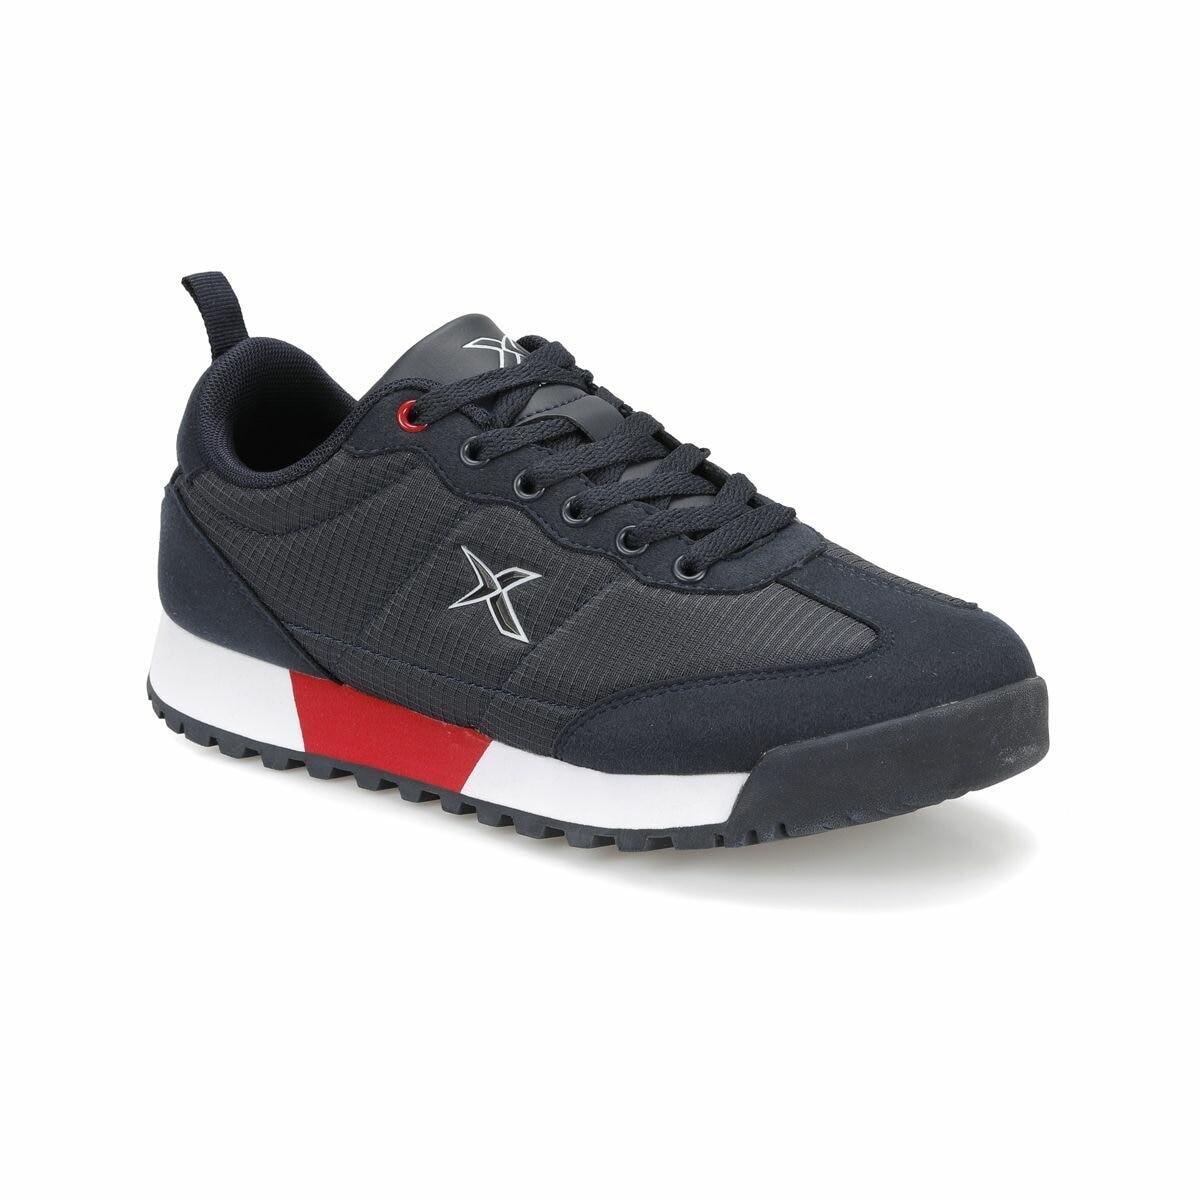 FLO RANK TX M Navy Blue Men 'S Sneaker Shoes KINETIX